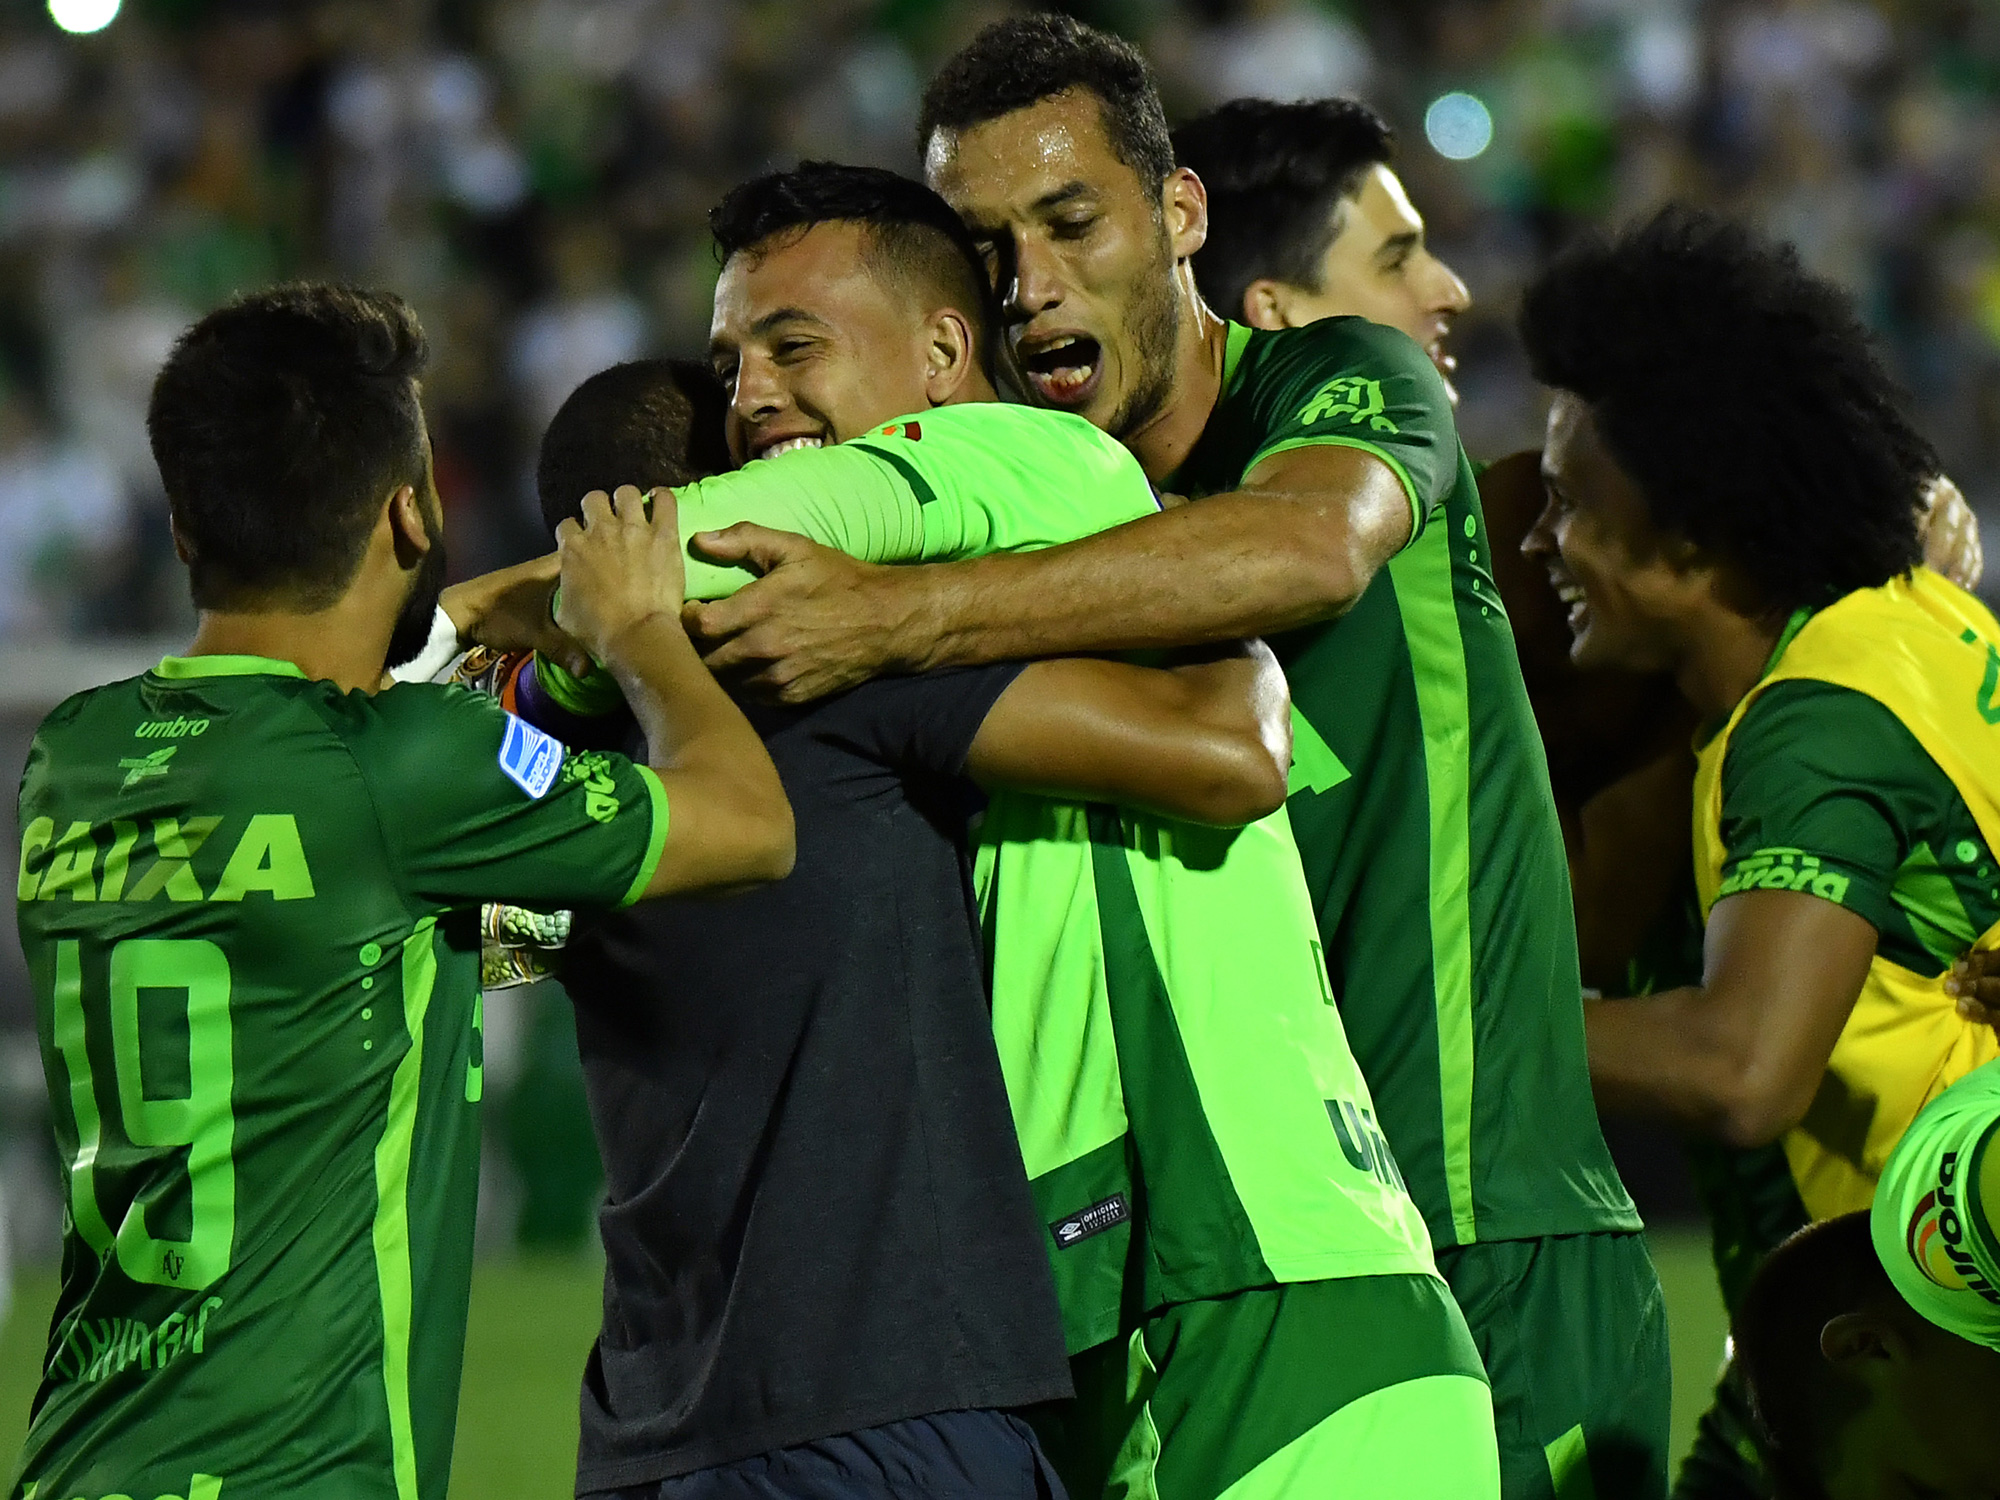 Chapecoense players celebrate during the Copa Sudamericana